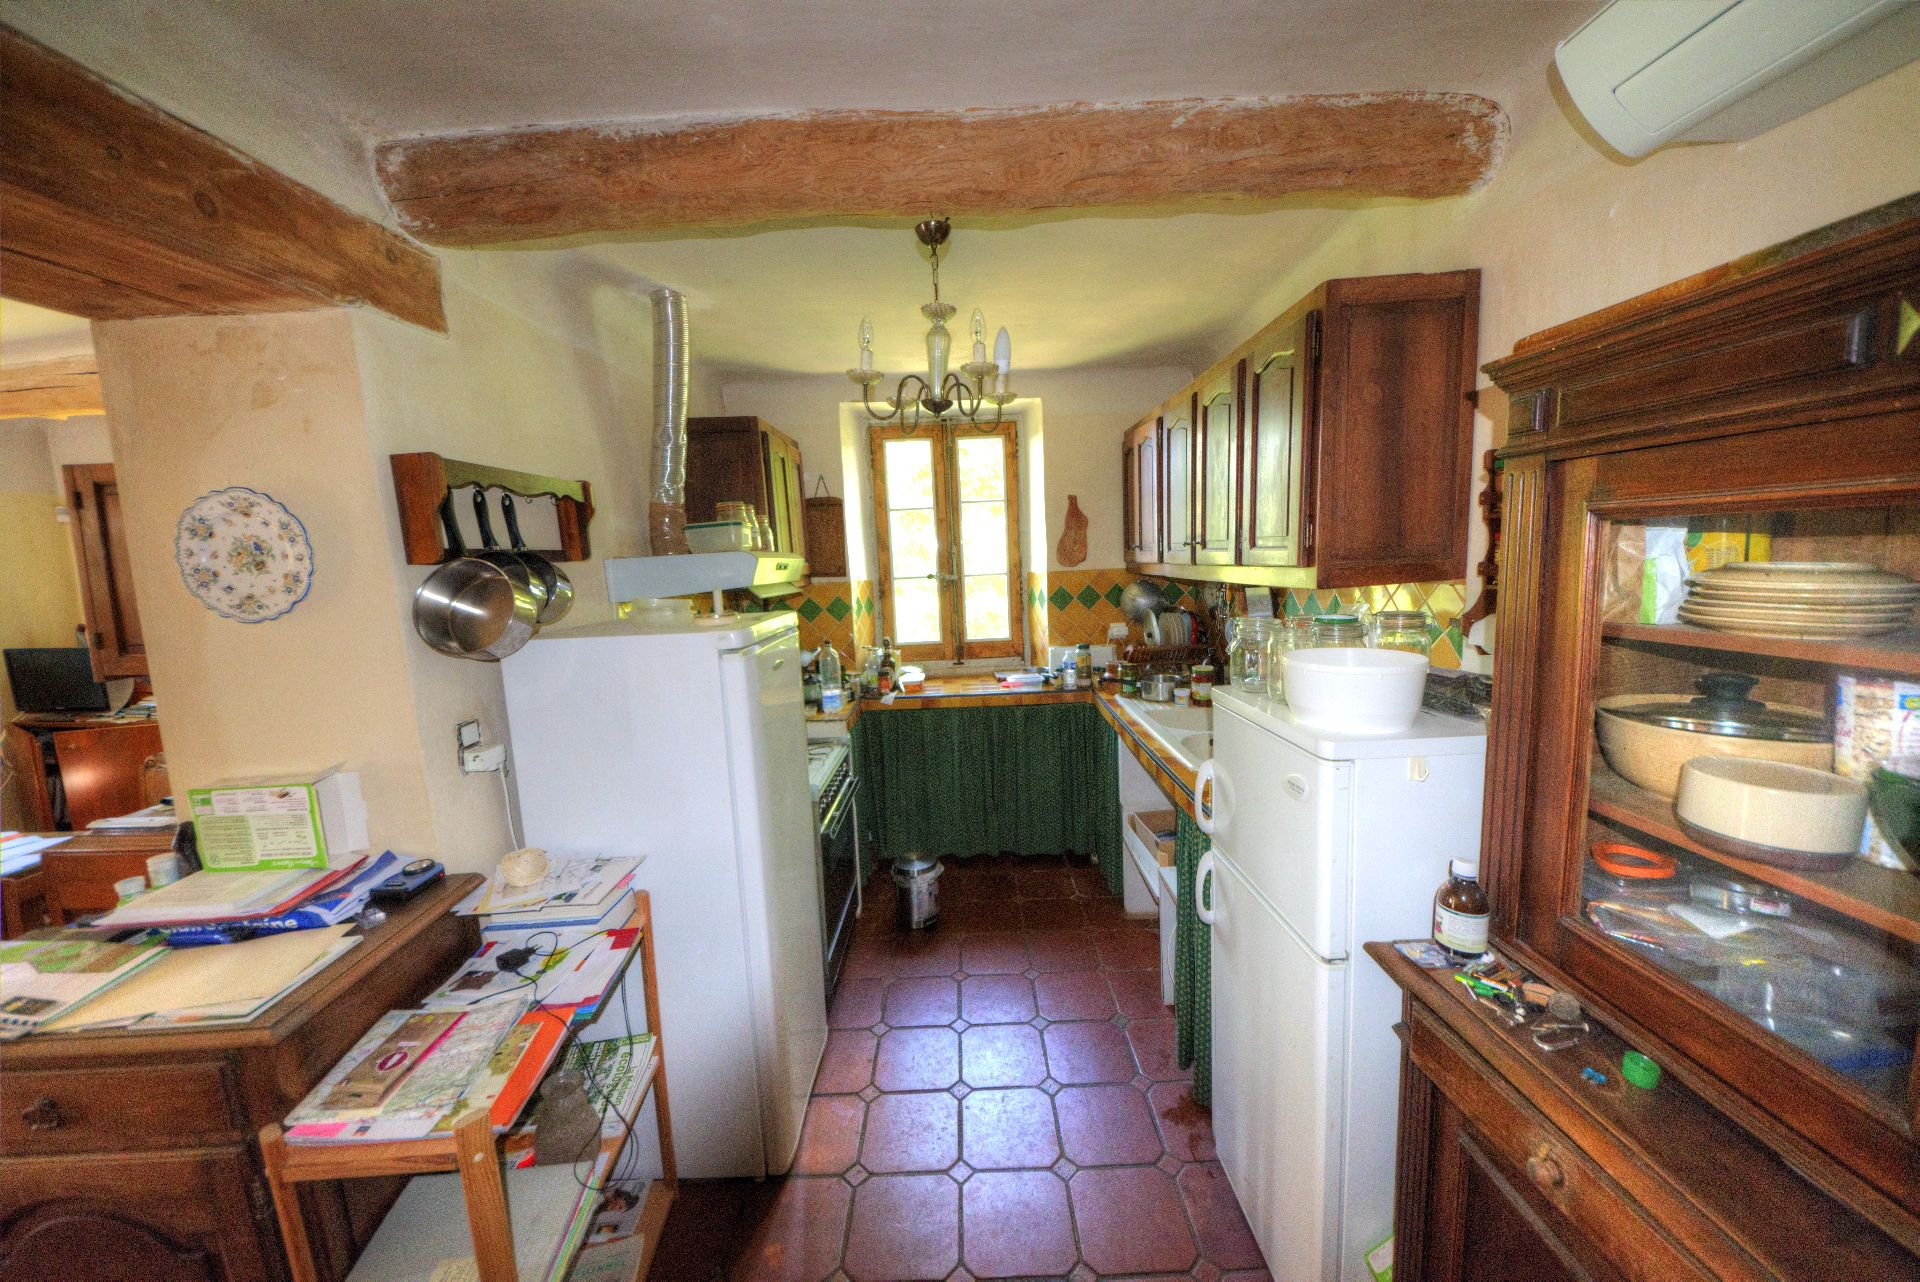 Kitchen bastide villecroze Var Provence